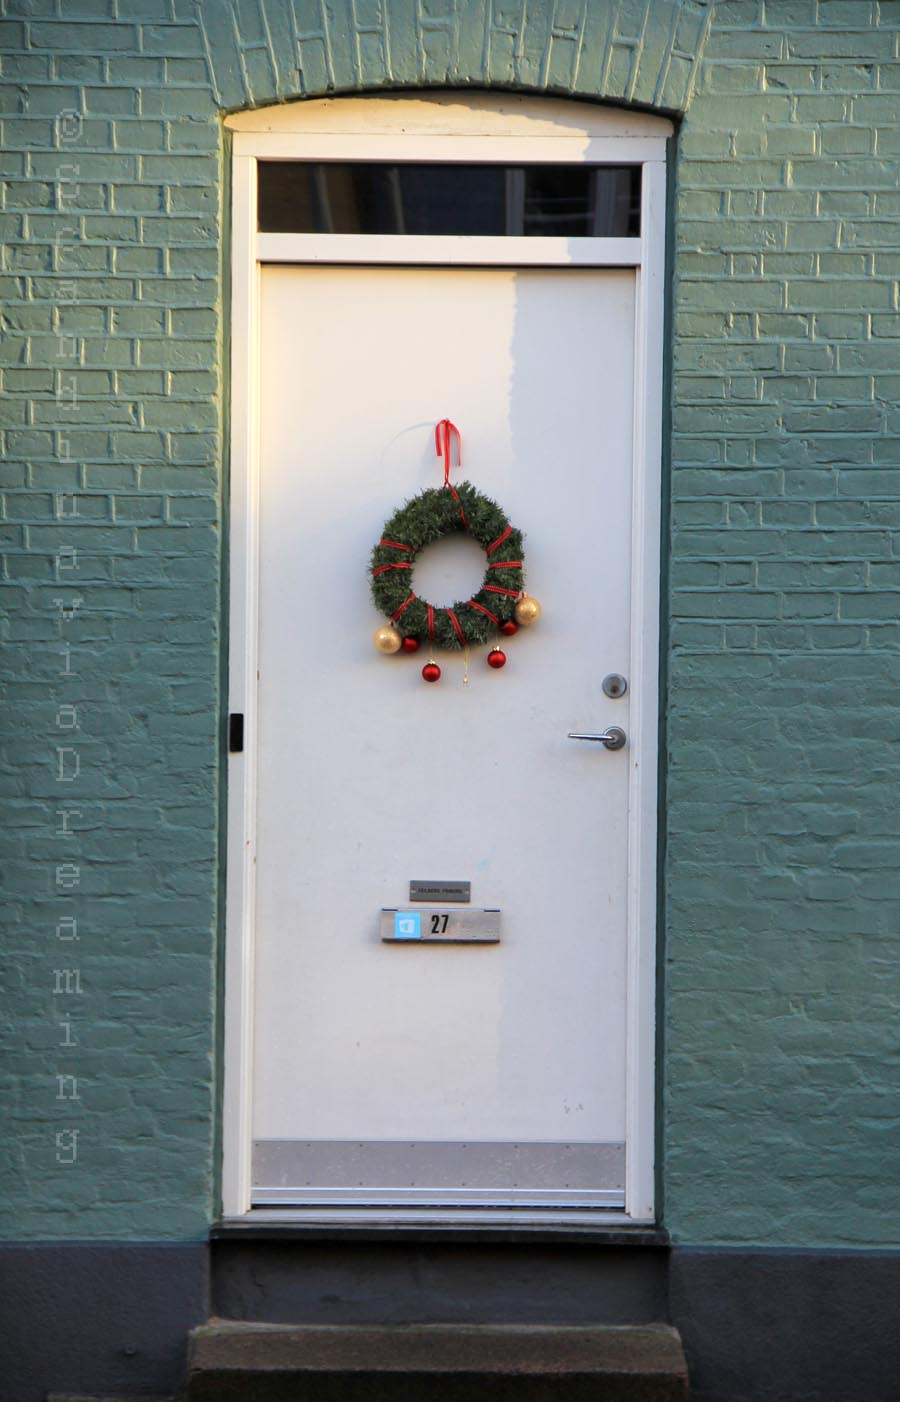 Porte de la maison bleue